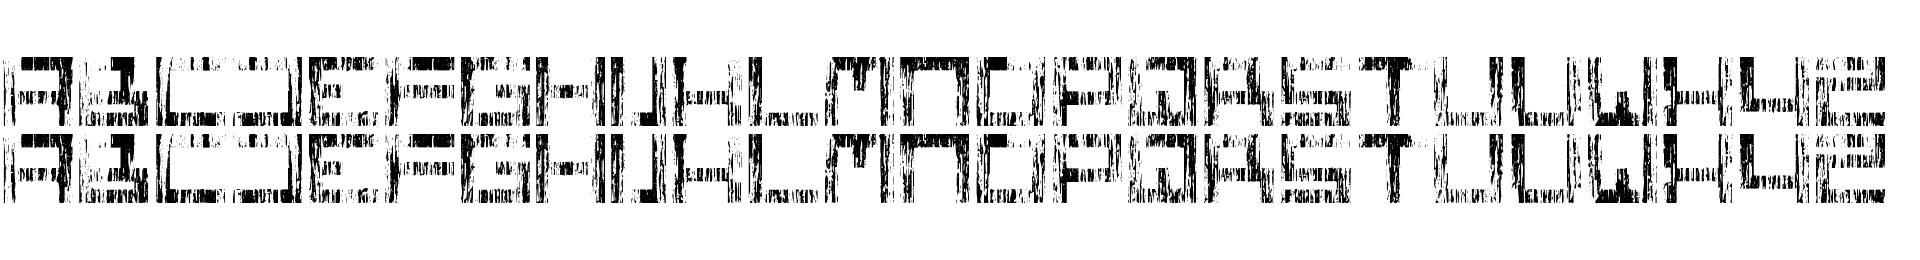 Square One Grunge